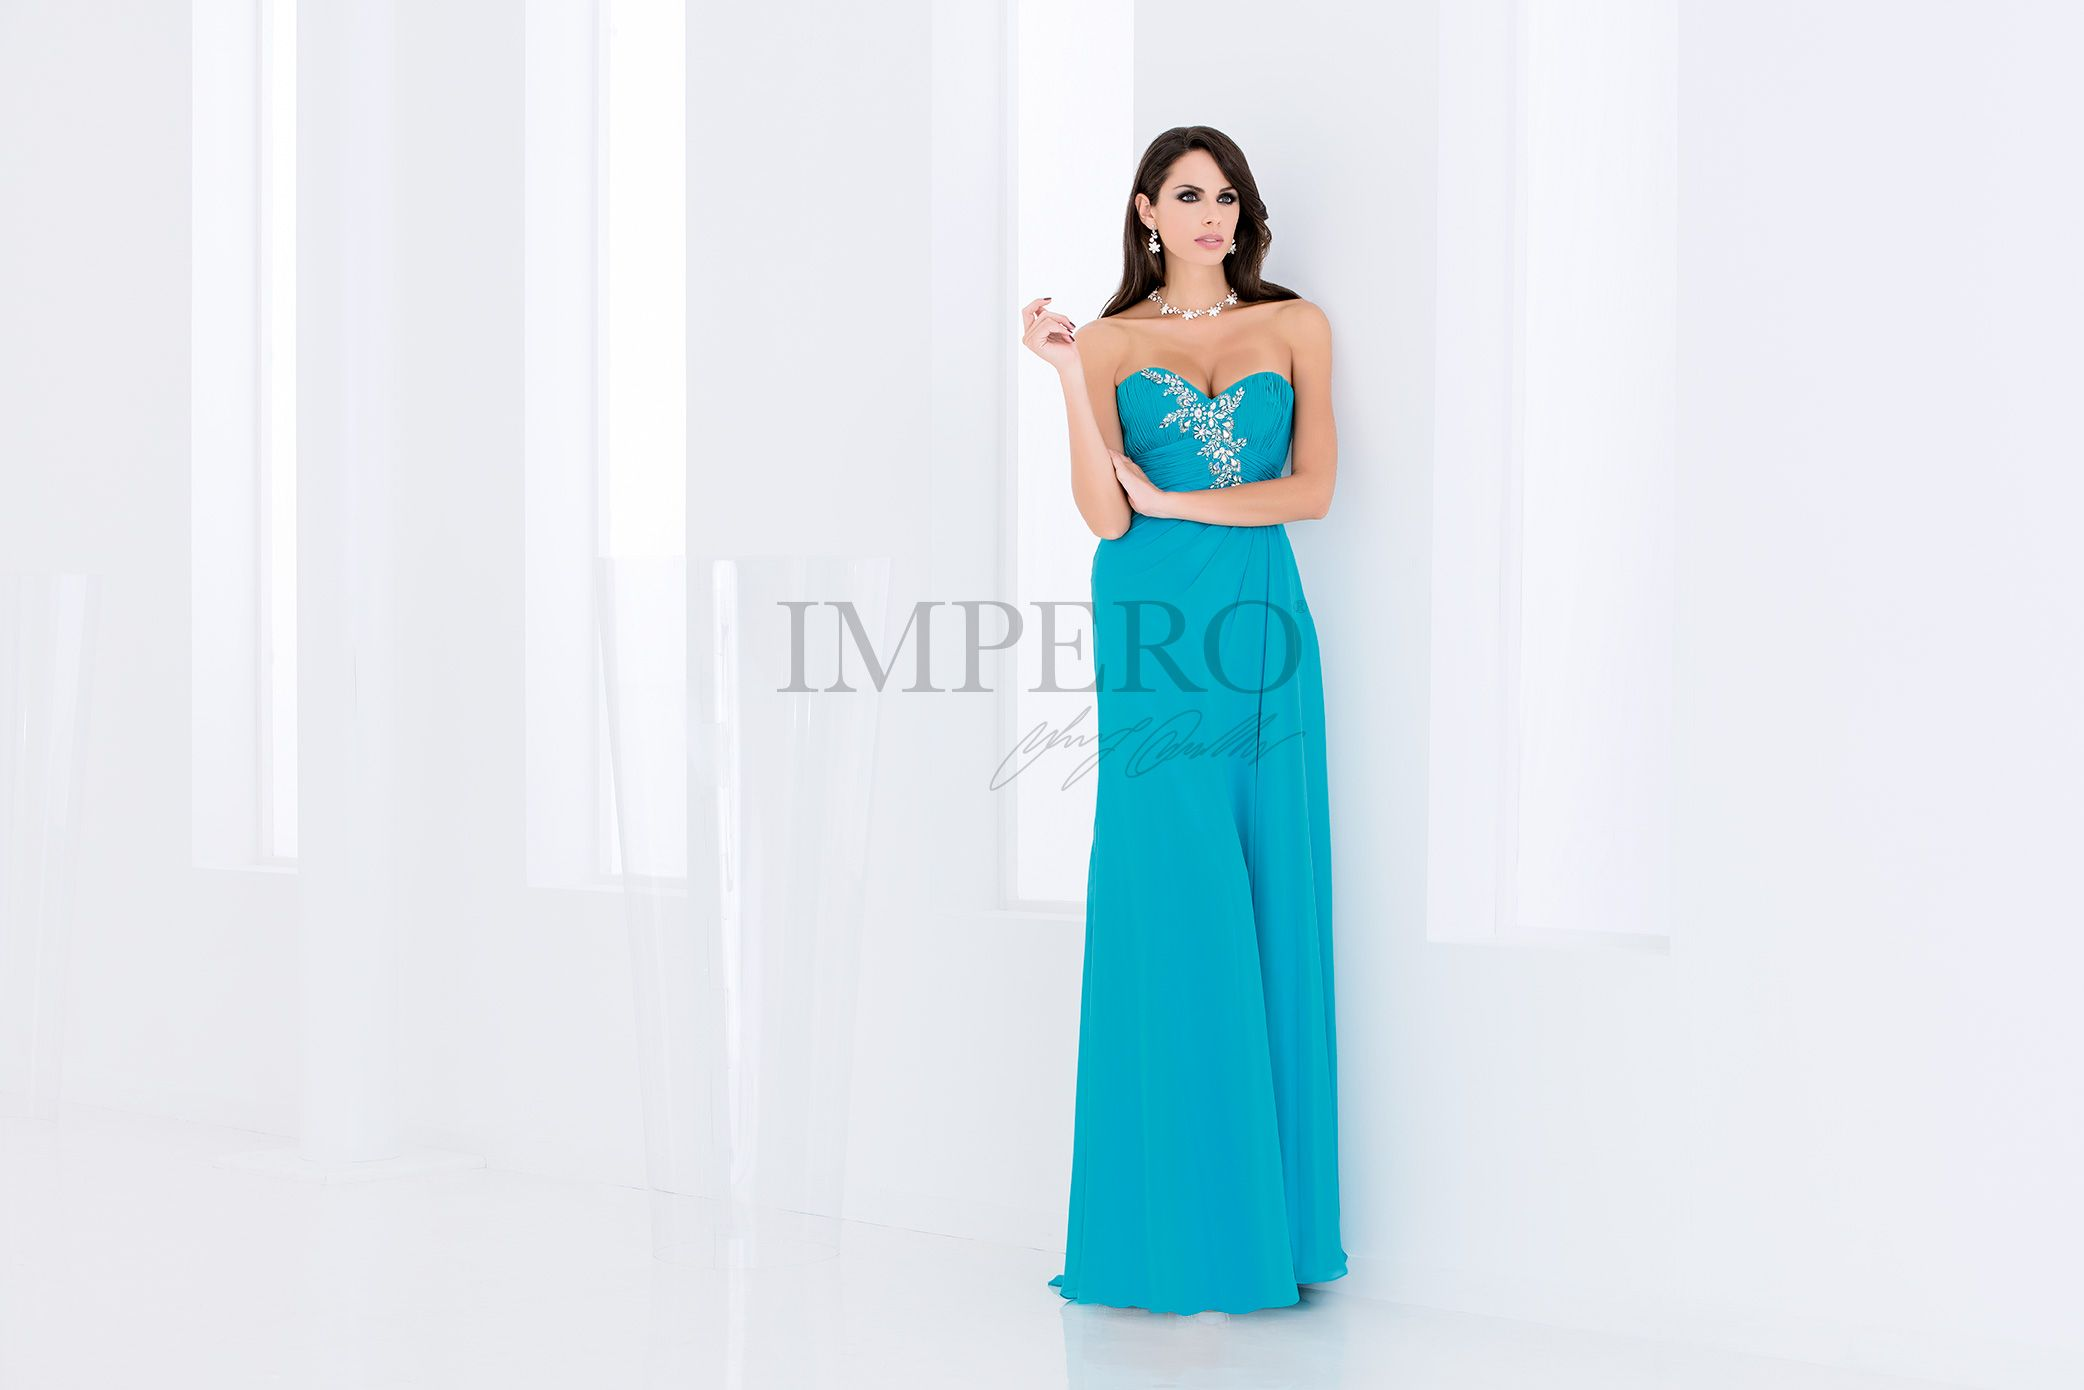 a8fe87078f40 IMPERO 5  abiti  dress  wedding  matrimonio  cerimonia  party  event   damigelle  turchese  turquoise